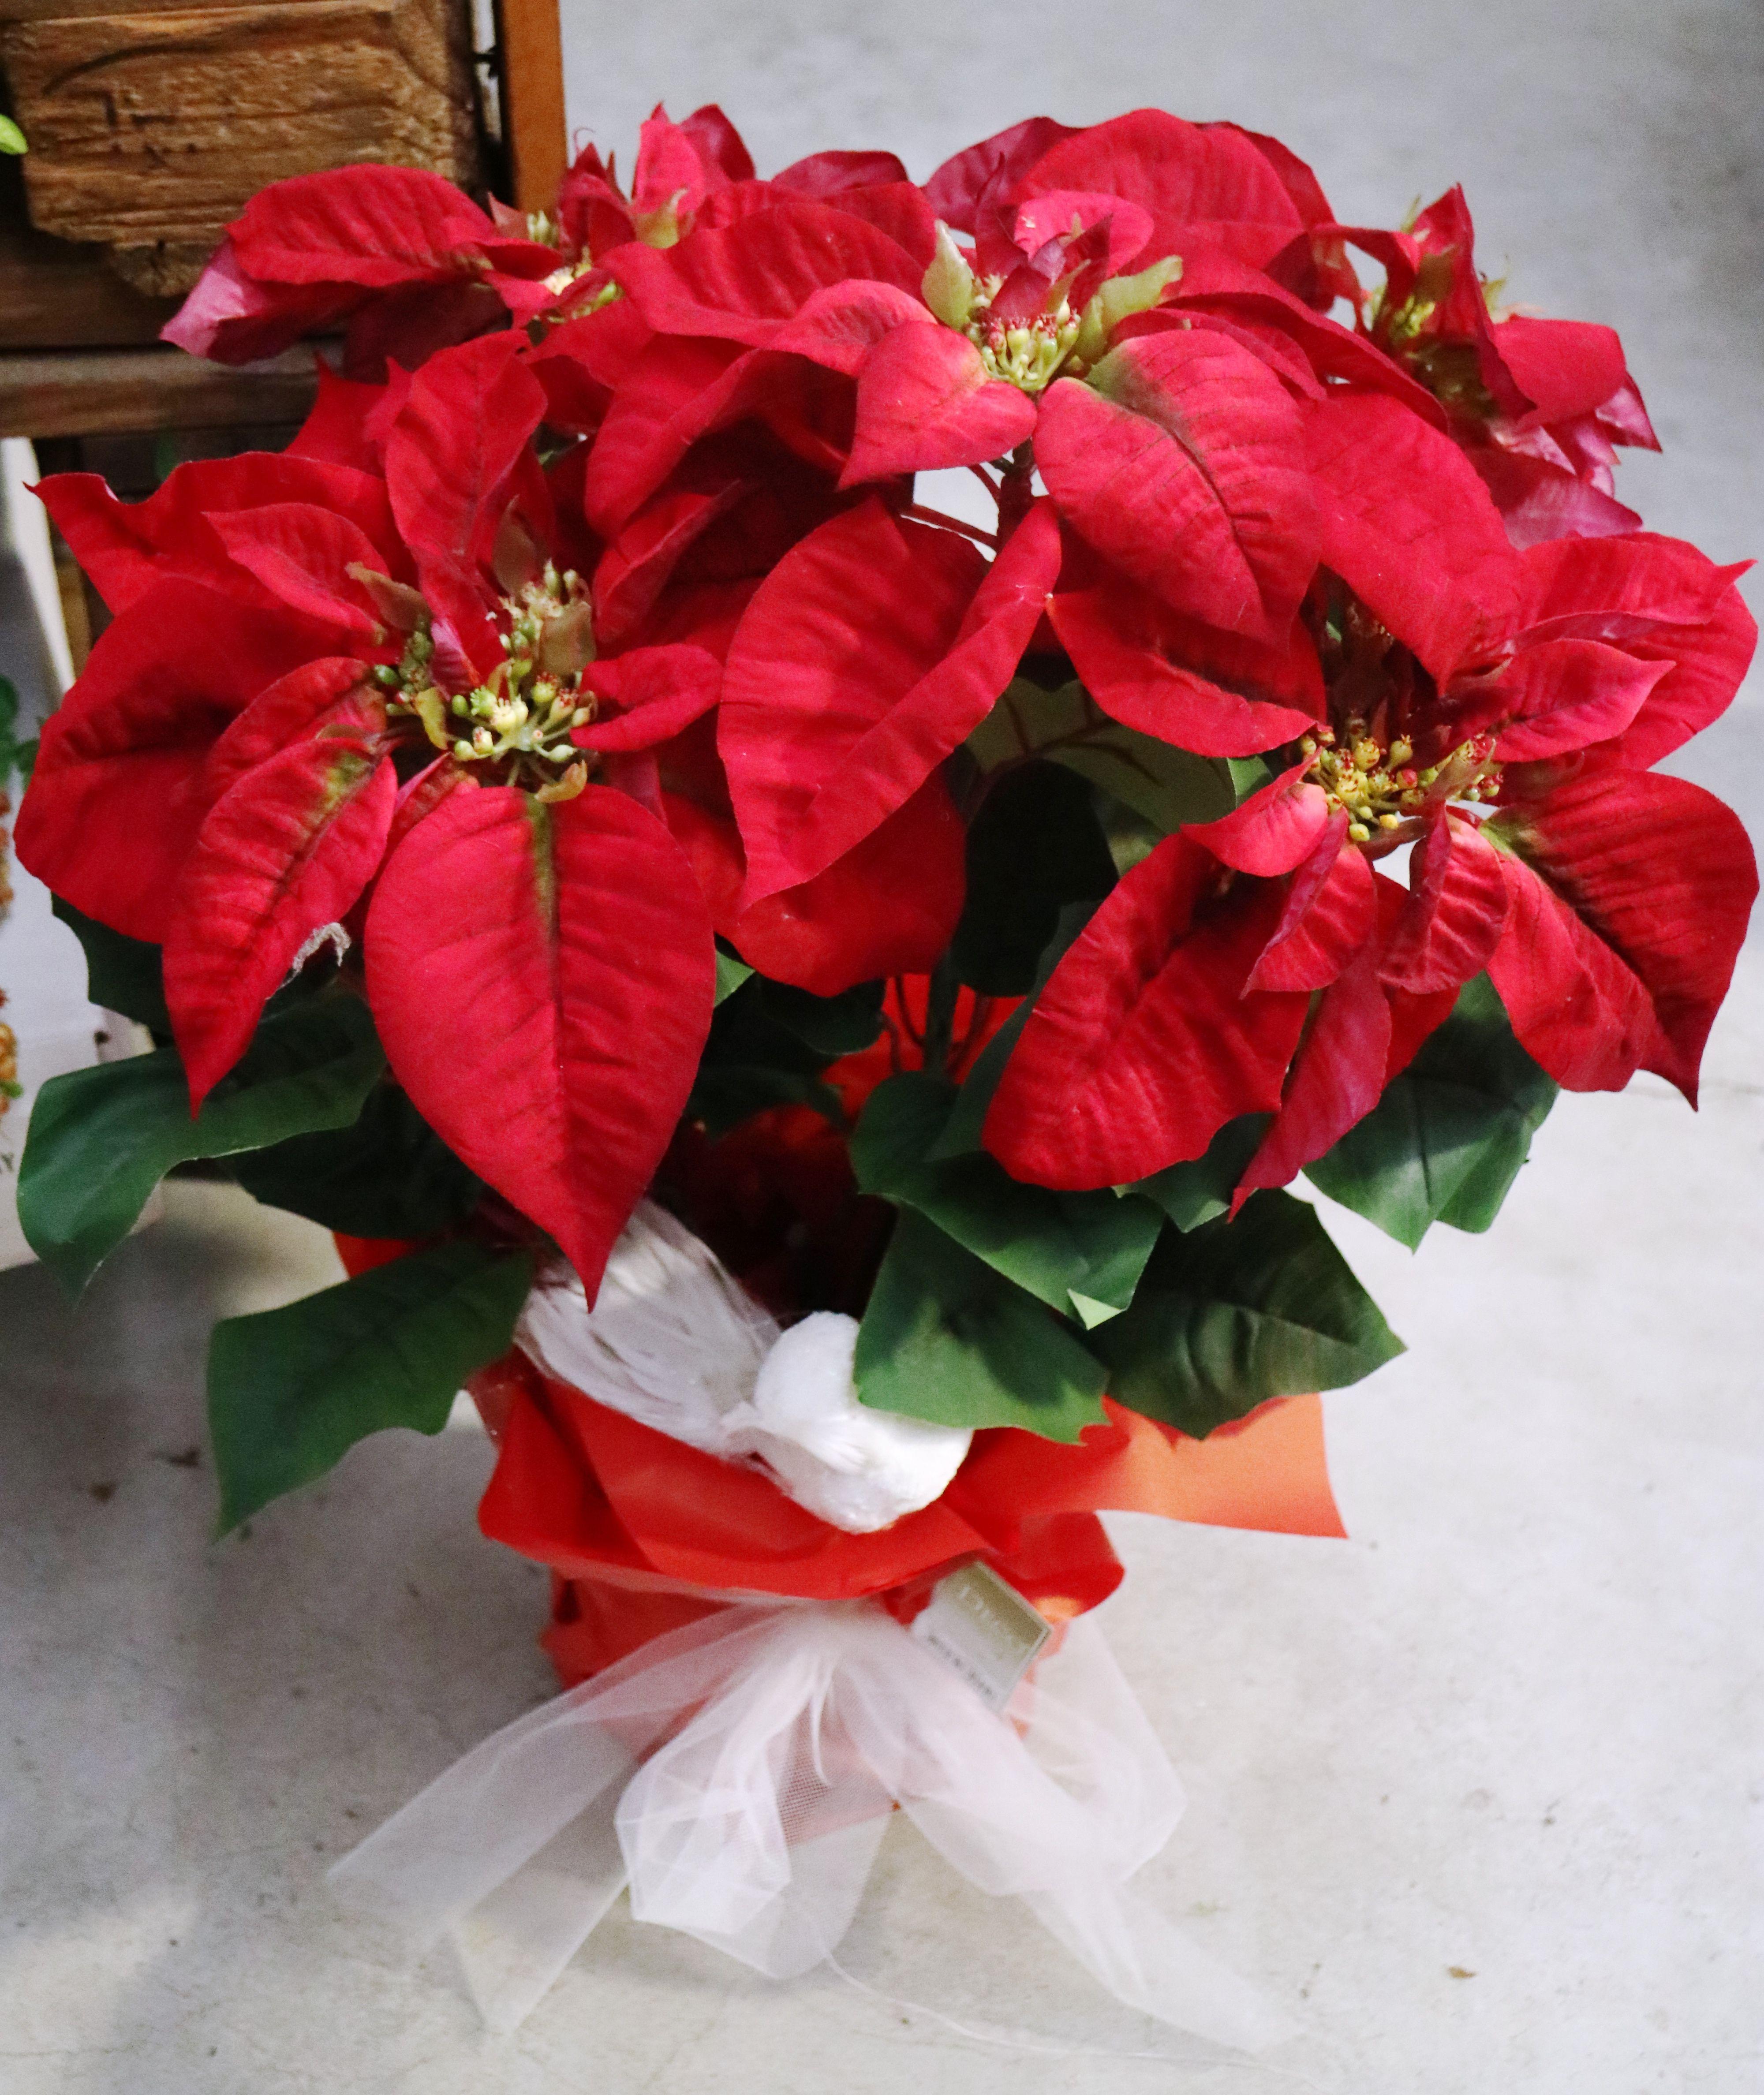 Stella Di Natale Artificiale.Stella Di Natale Artificiale Piante Piante Natale E Stelle